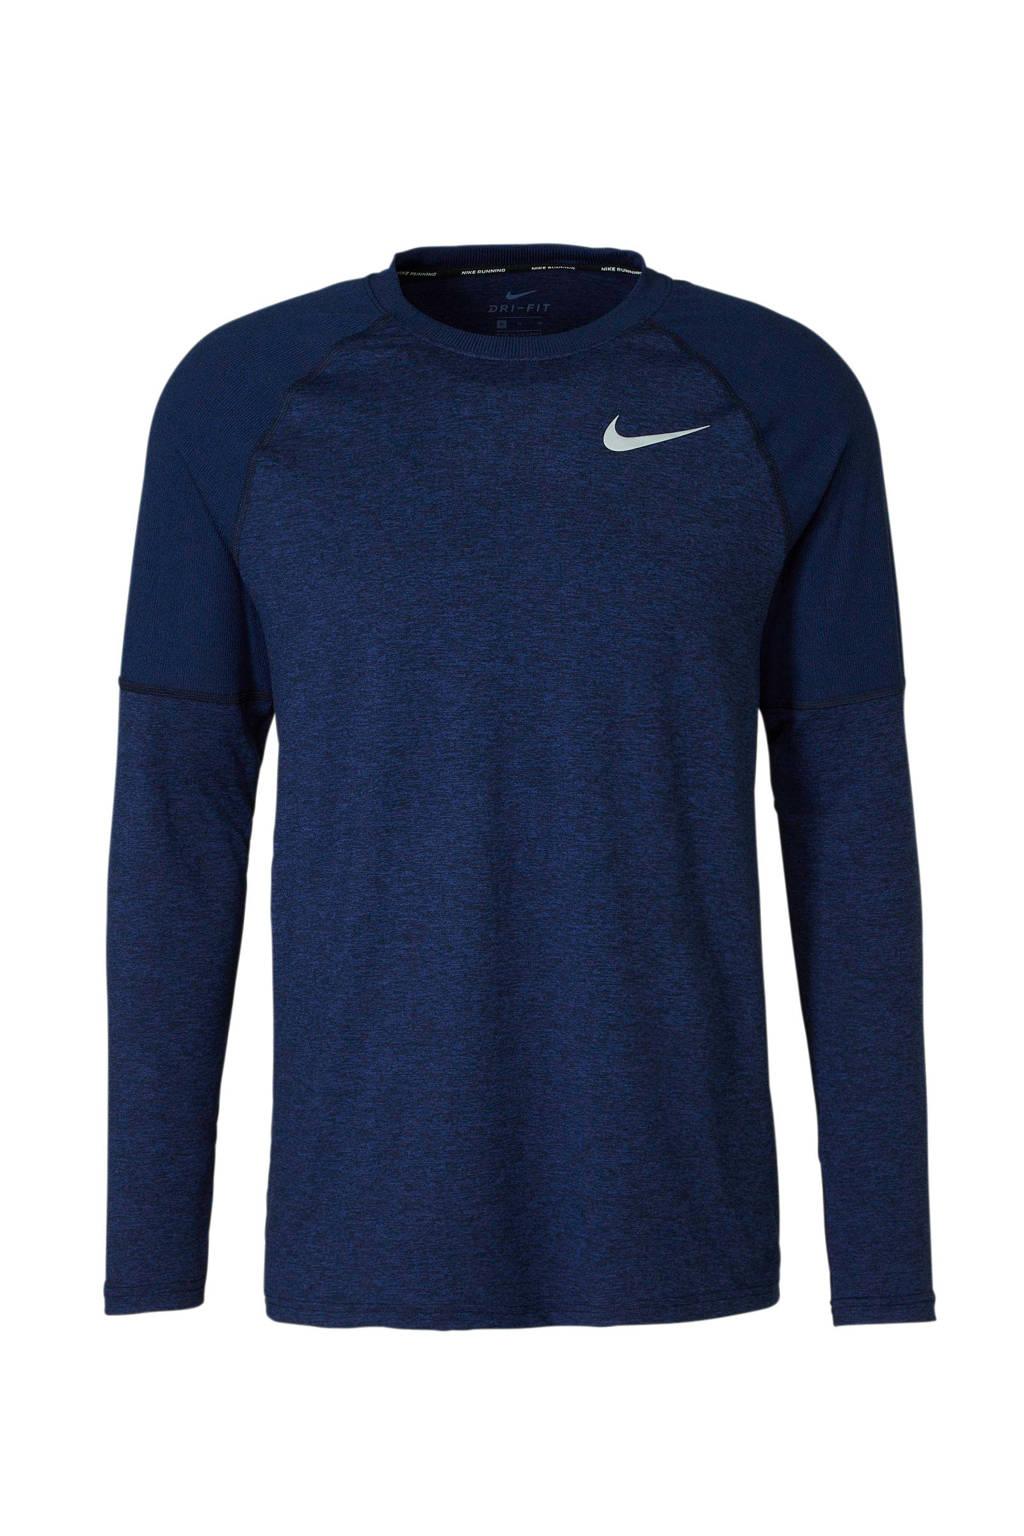 Nike   hardloop T-shirt, blauw melange